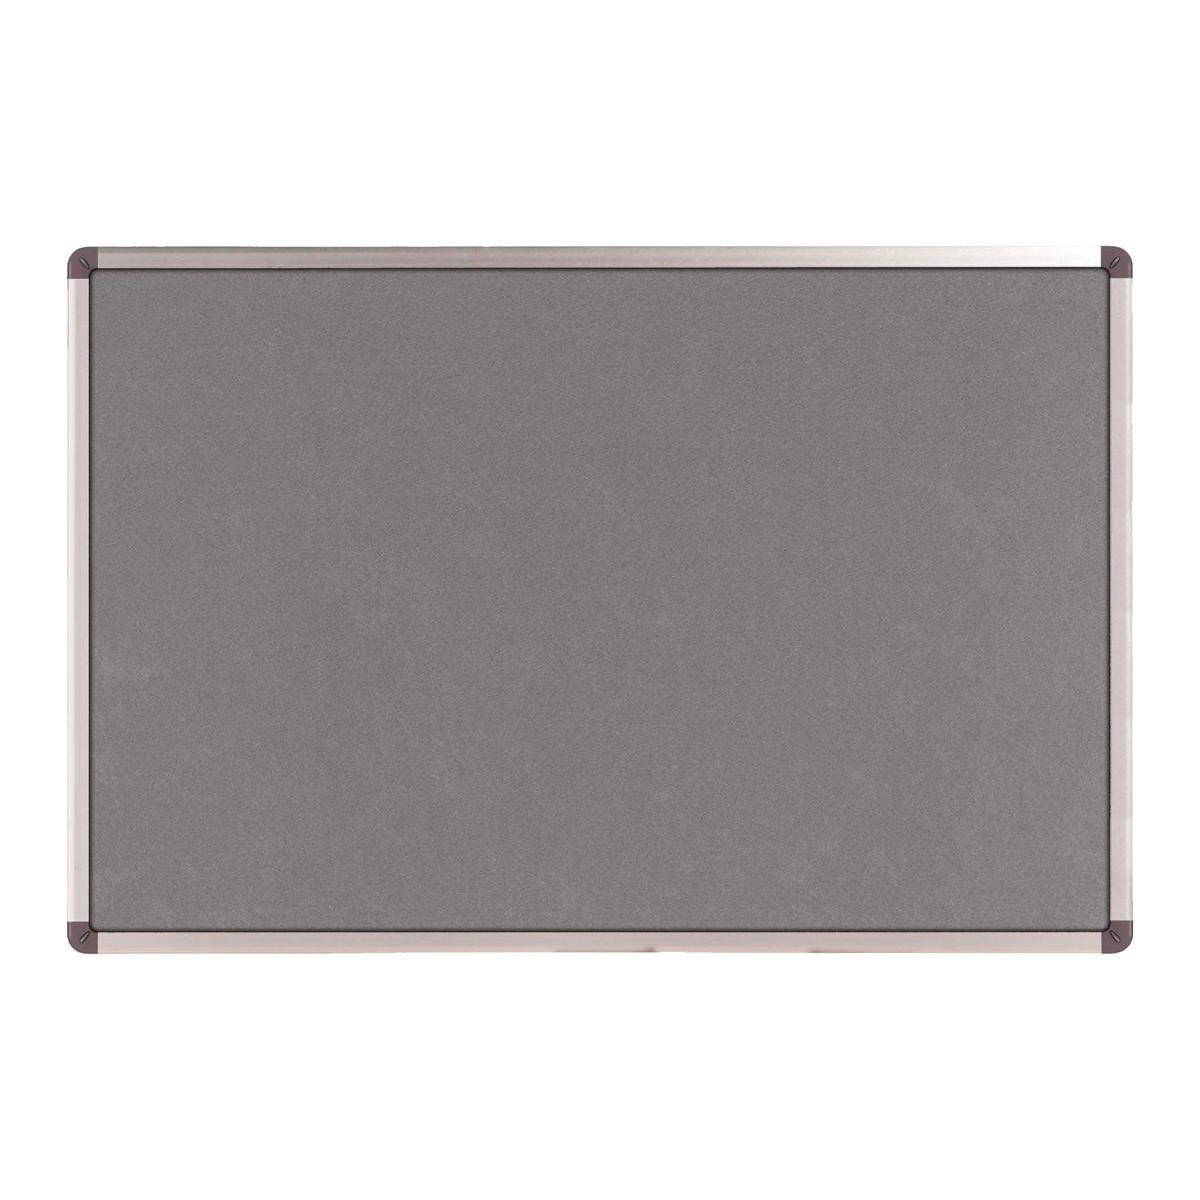 Nobo Classic Noticeboard Felt with Aluminium Frame W1200xH900mm Grey Ref 1900912